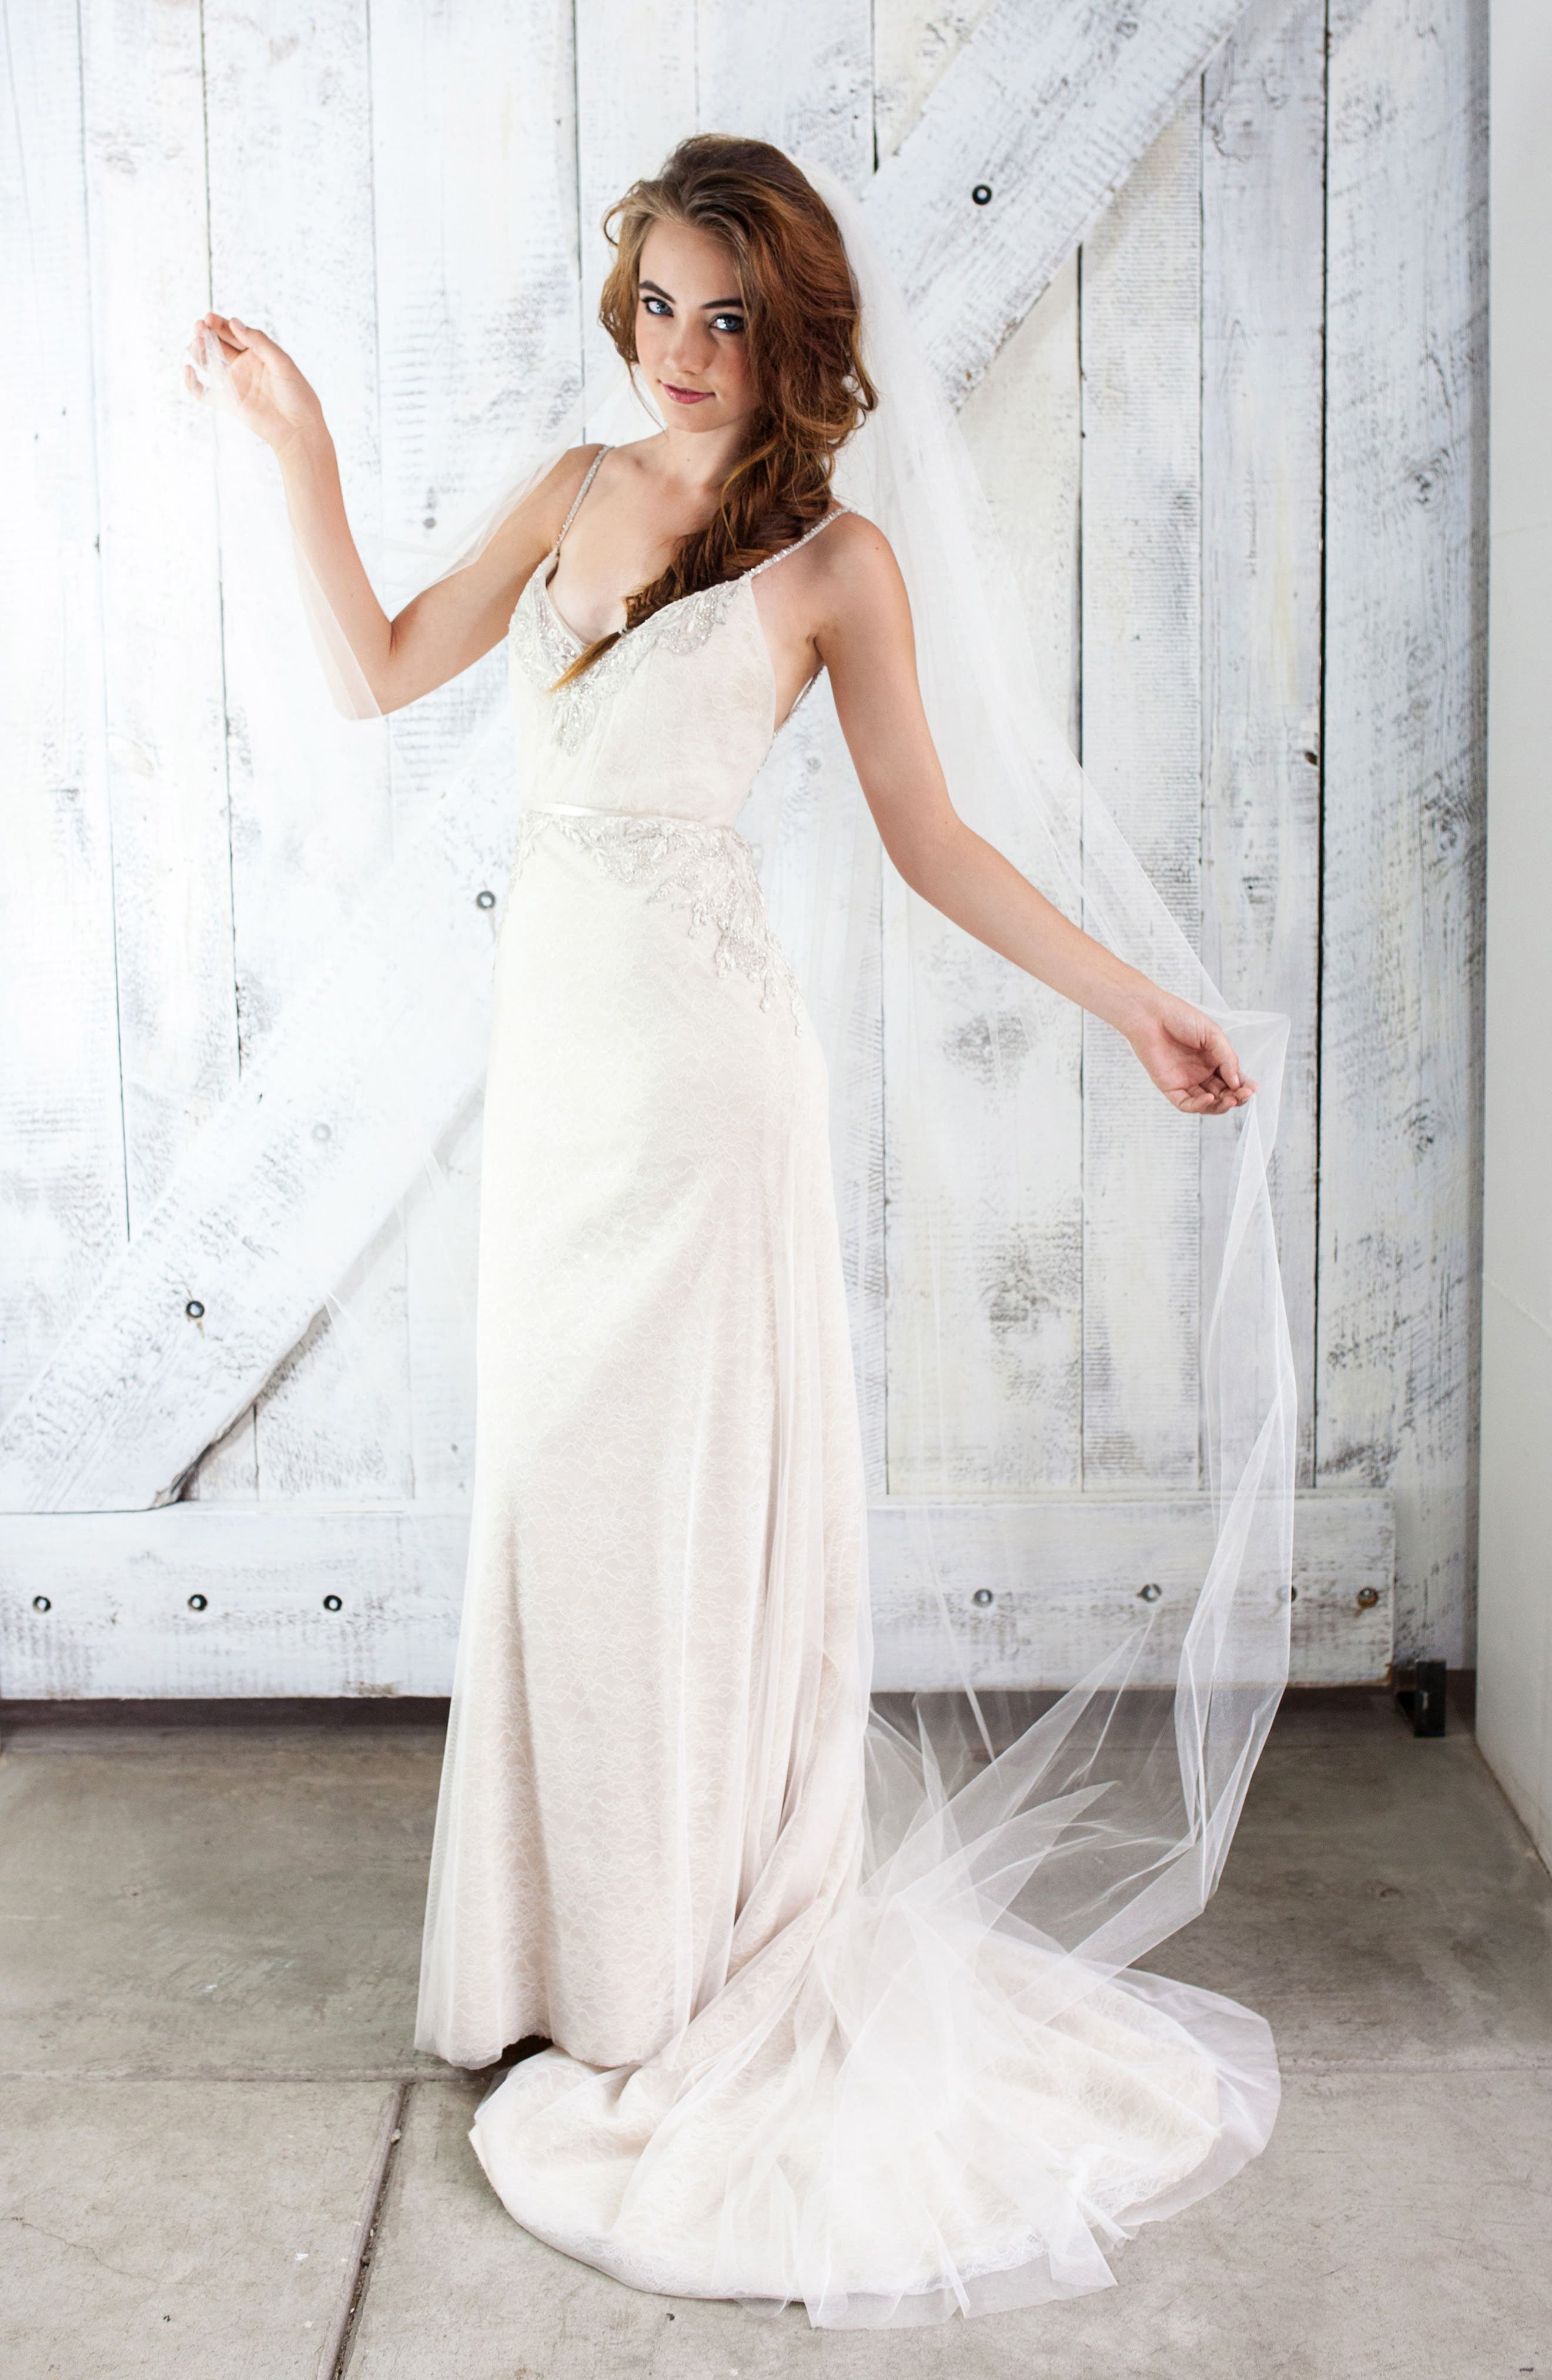 VEIL TRENDS Nosara Bridal Veil